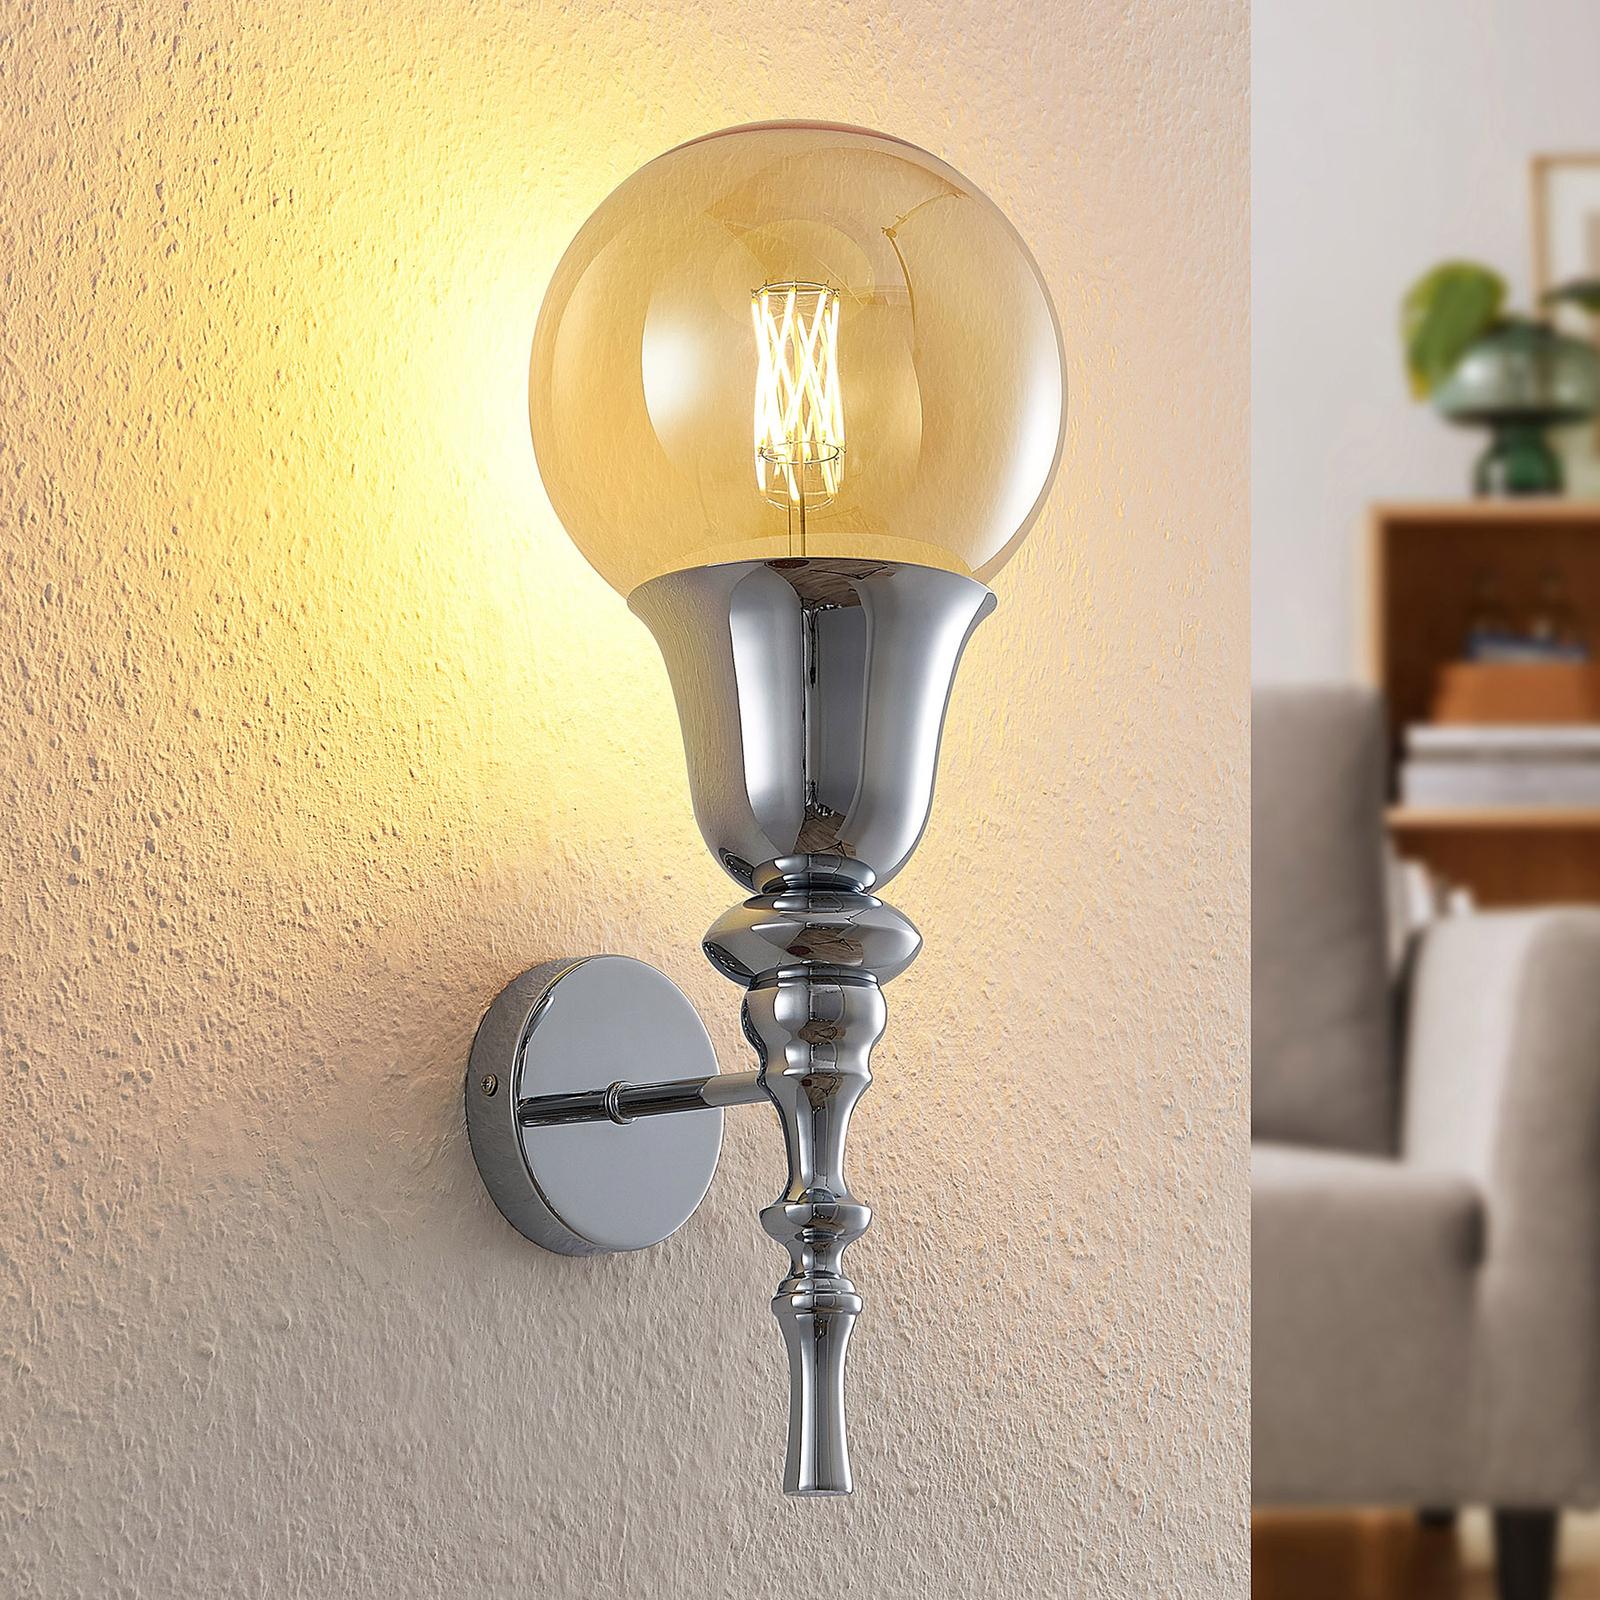 Lucande Gesja væglampe, 1 lyskilde, krom